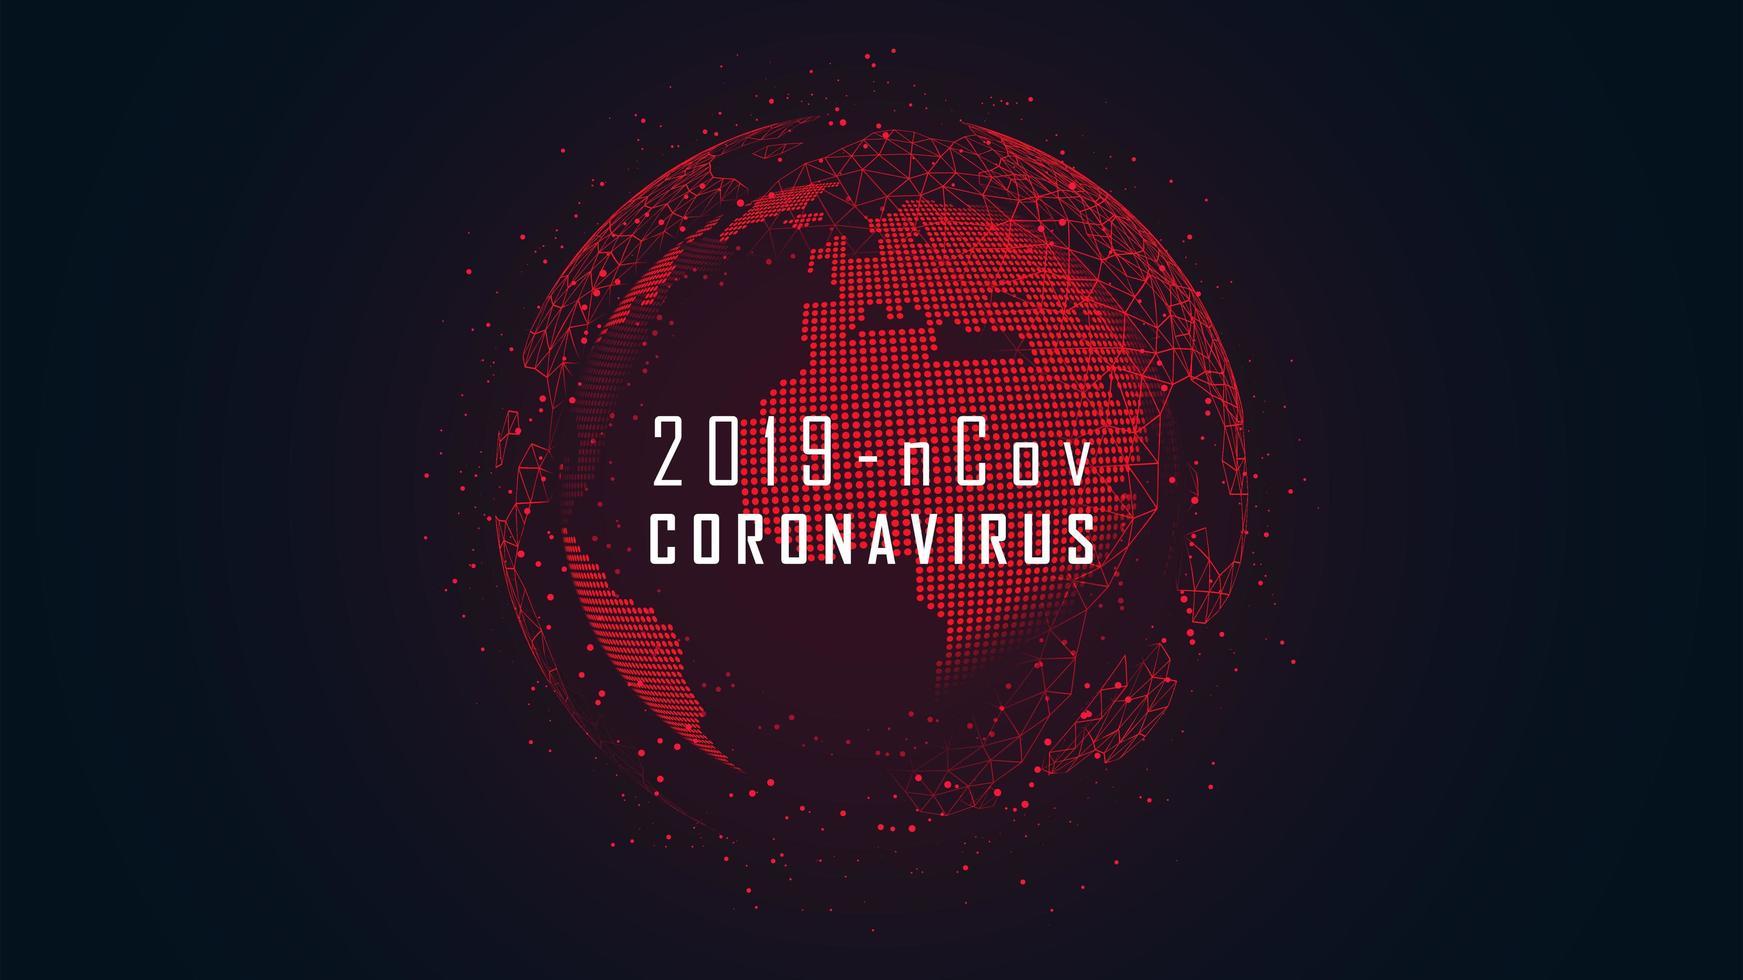 Coronavirus globales Pandemie-Ausbruch-Wireframe-Design vektor